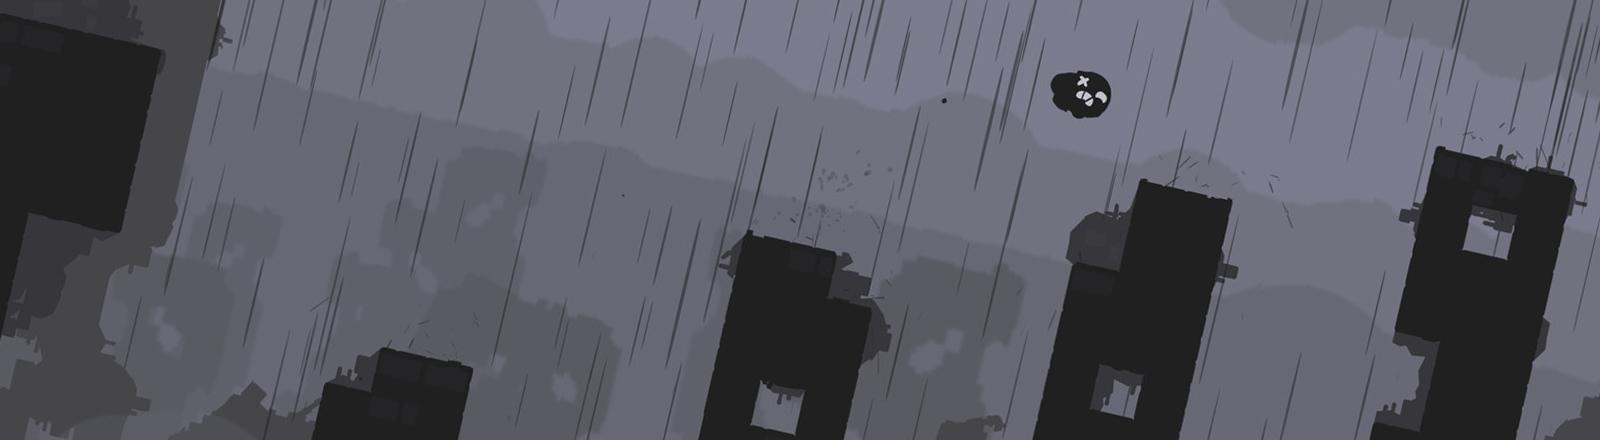 "Szene aus dem Spiel ""The End is Nigh""."